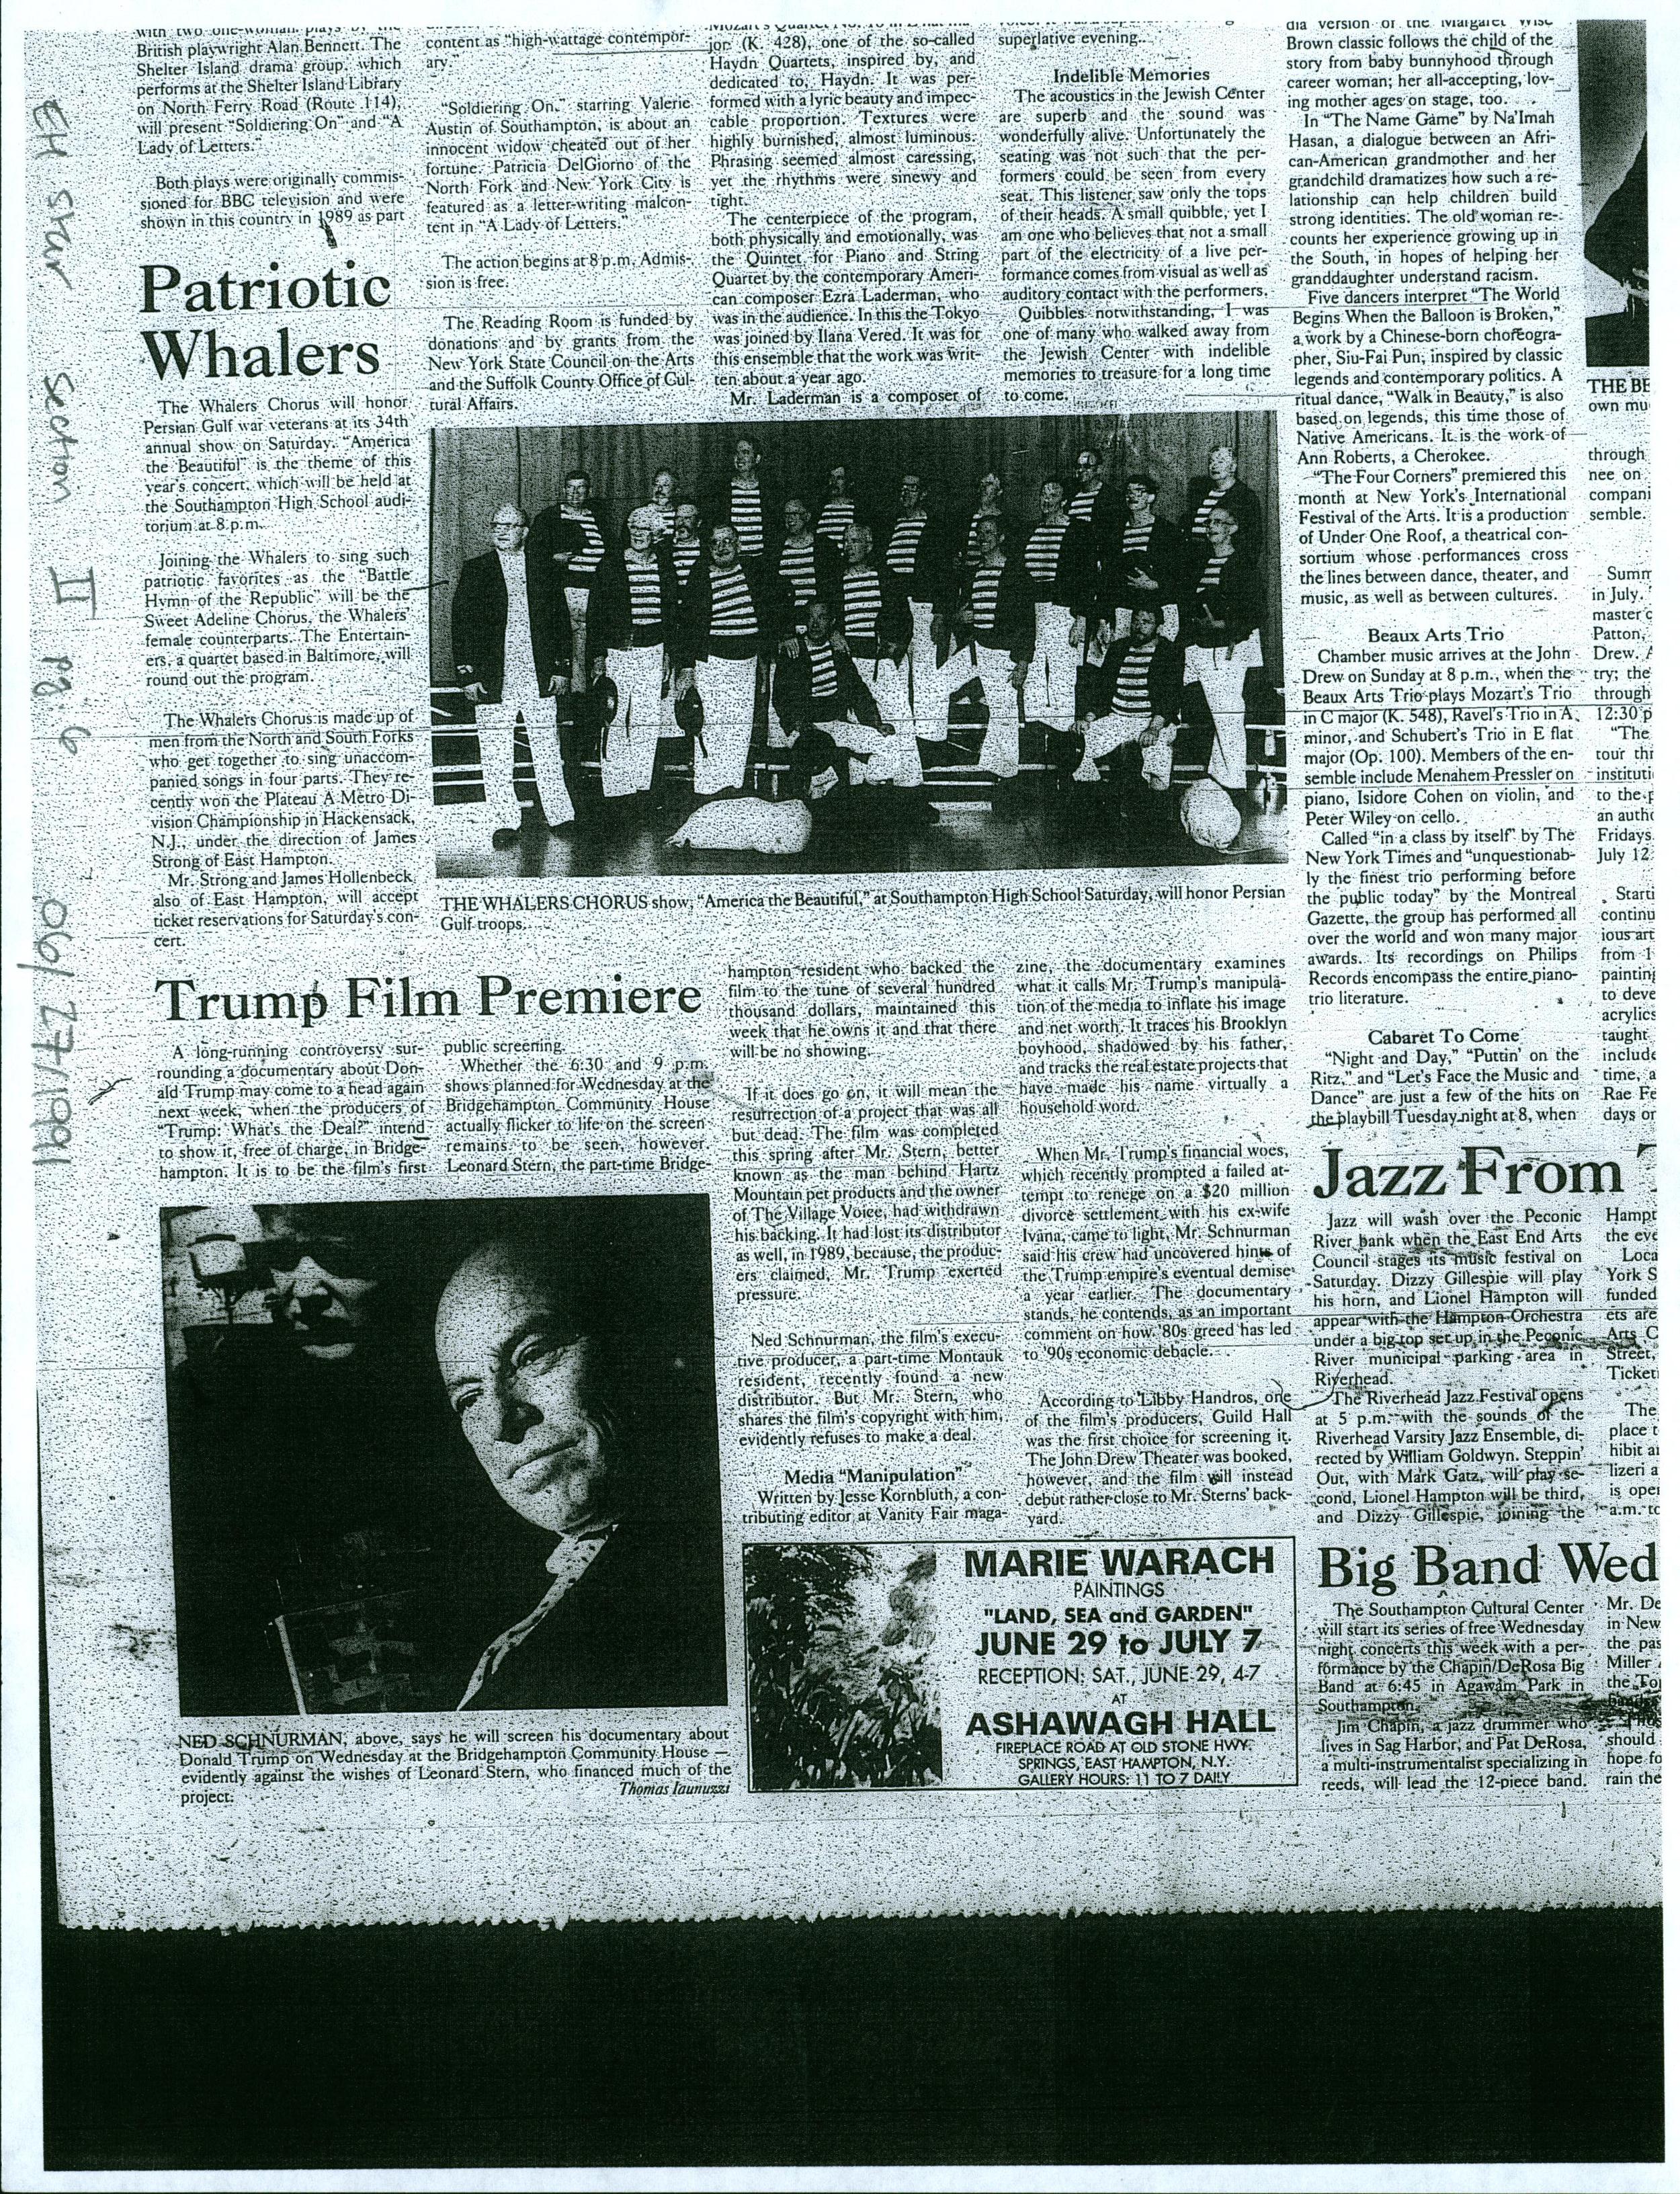 E.H. Star, July 11, 1991_Tump Film Review-1 copy.jpg